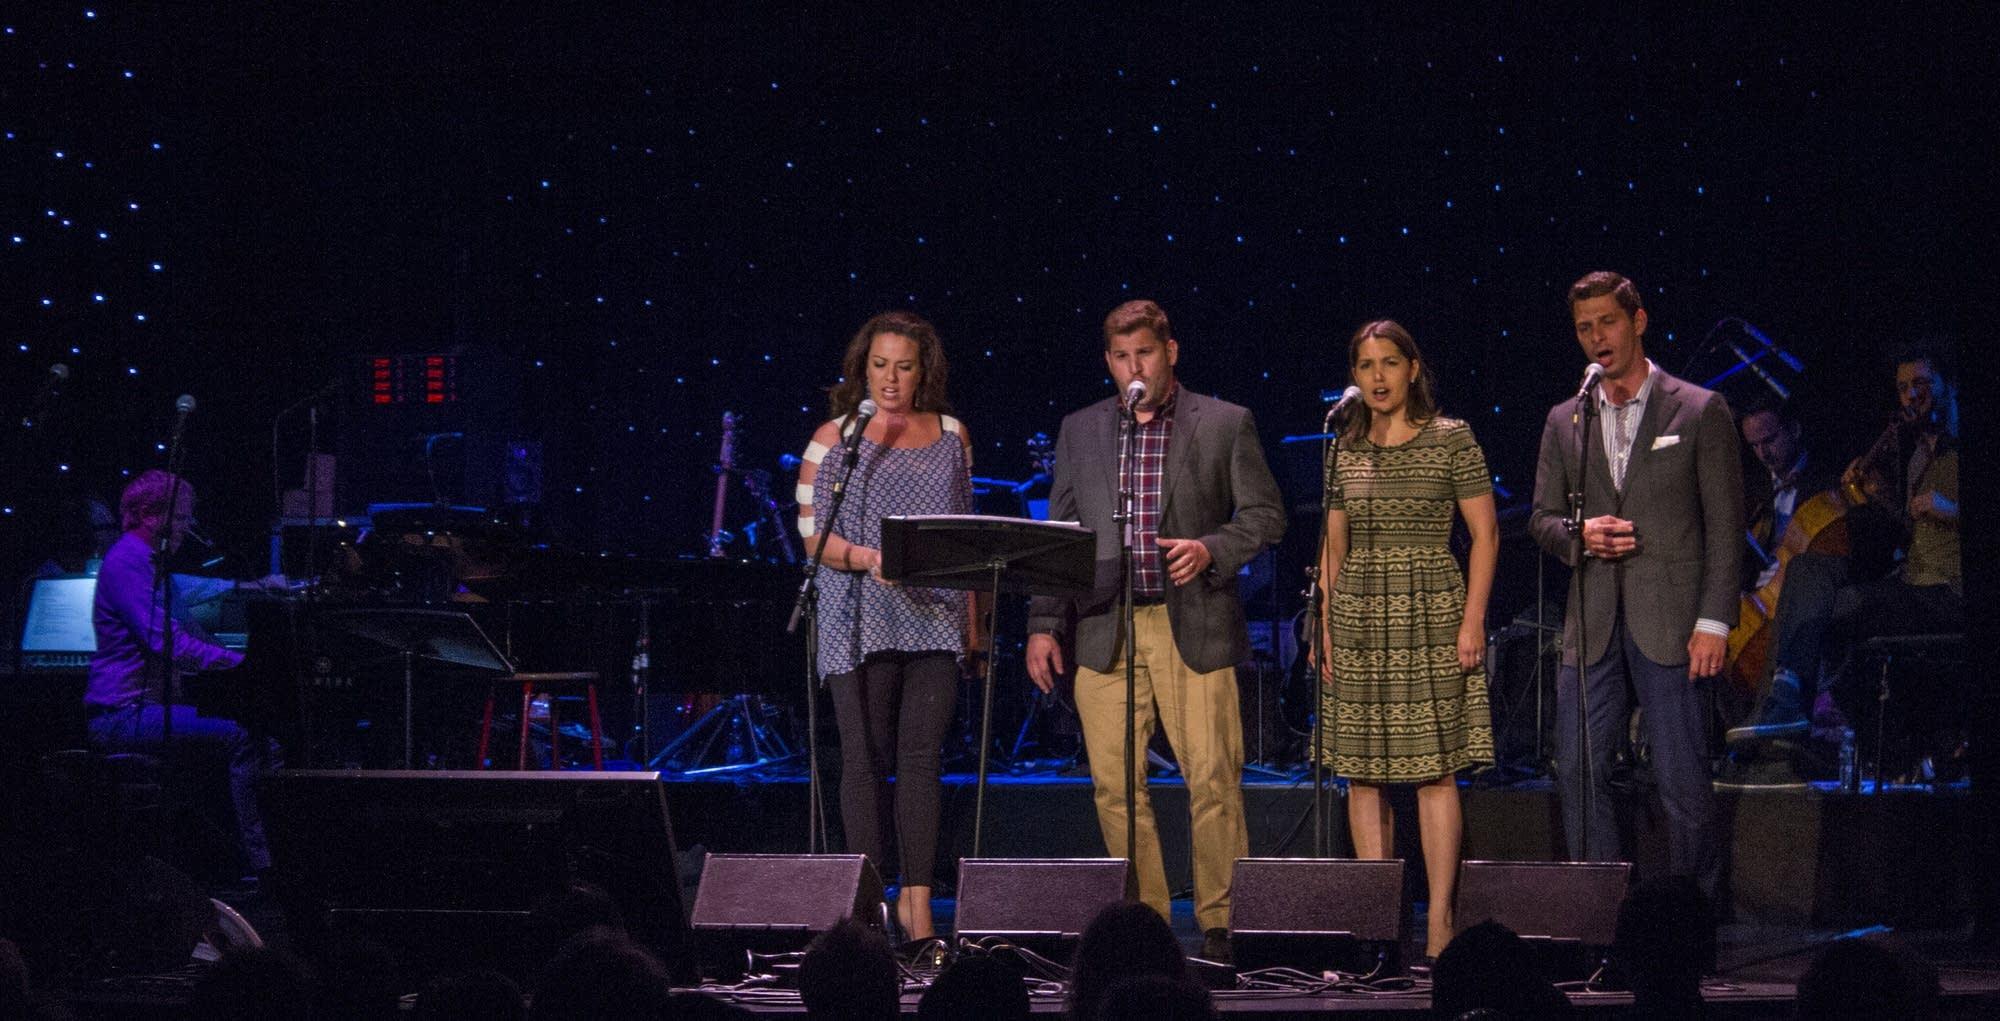 Edinburgh - 37 - Opera quartet